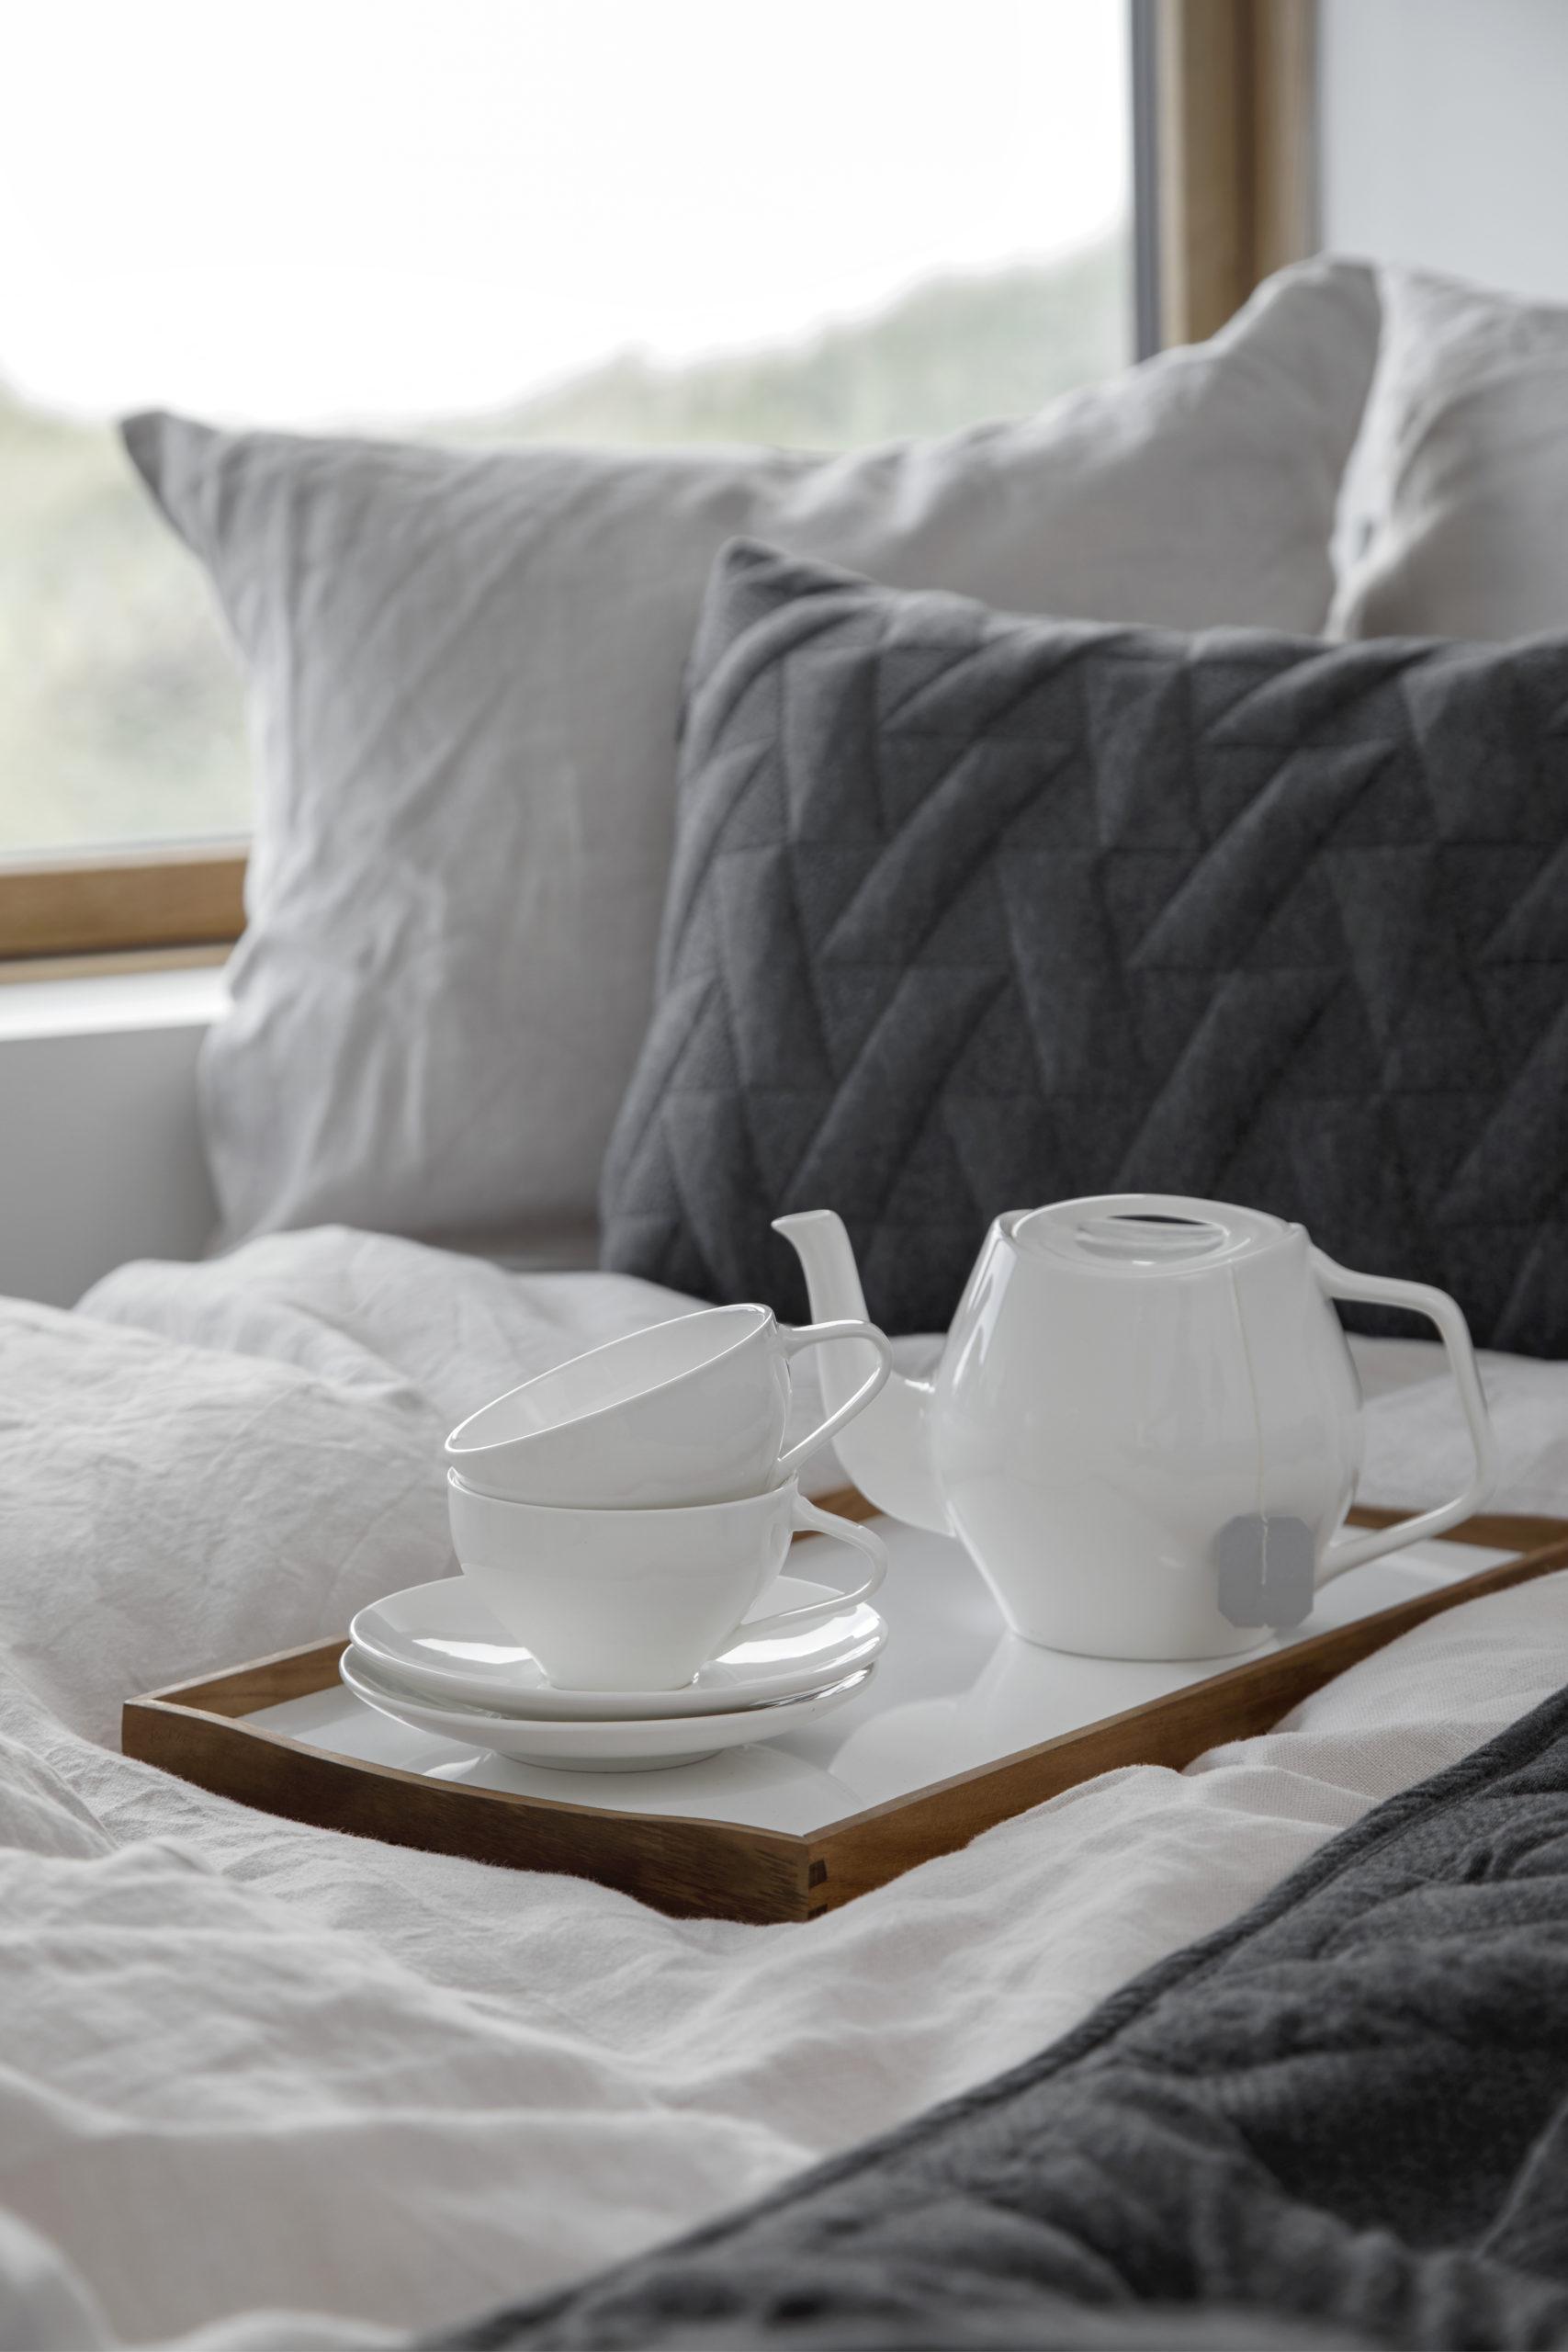 Architectmade-FJ-Essence-Porcelain-Tea-Set-Denmark-Finn-Juhl-5